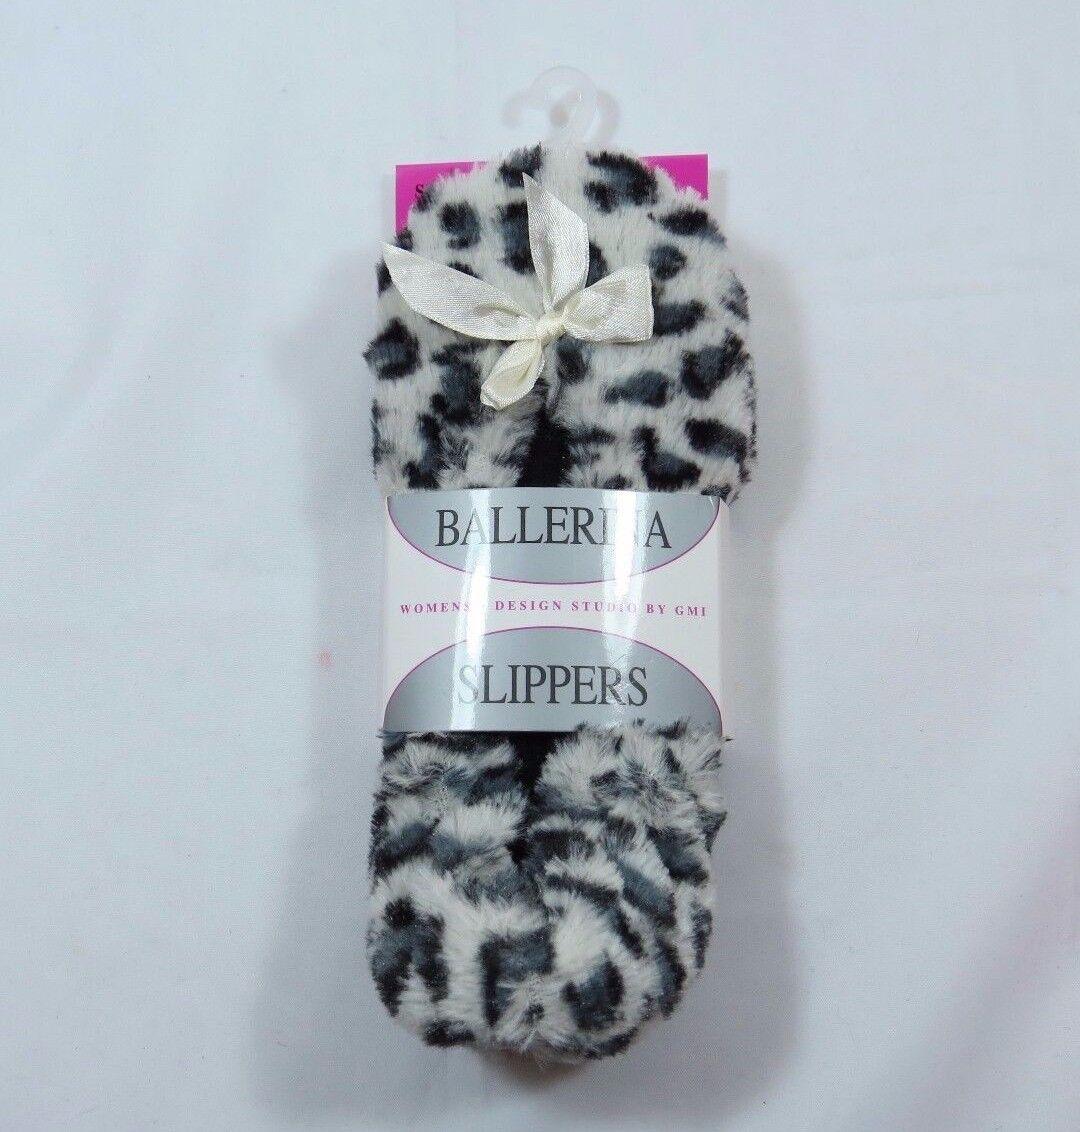 Womans Ballerina Fuzzy Leopard Cheetah No Print Slippers Sz Small No Cheetah Slip Sole WARM dfb6f4